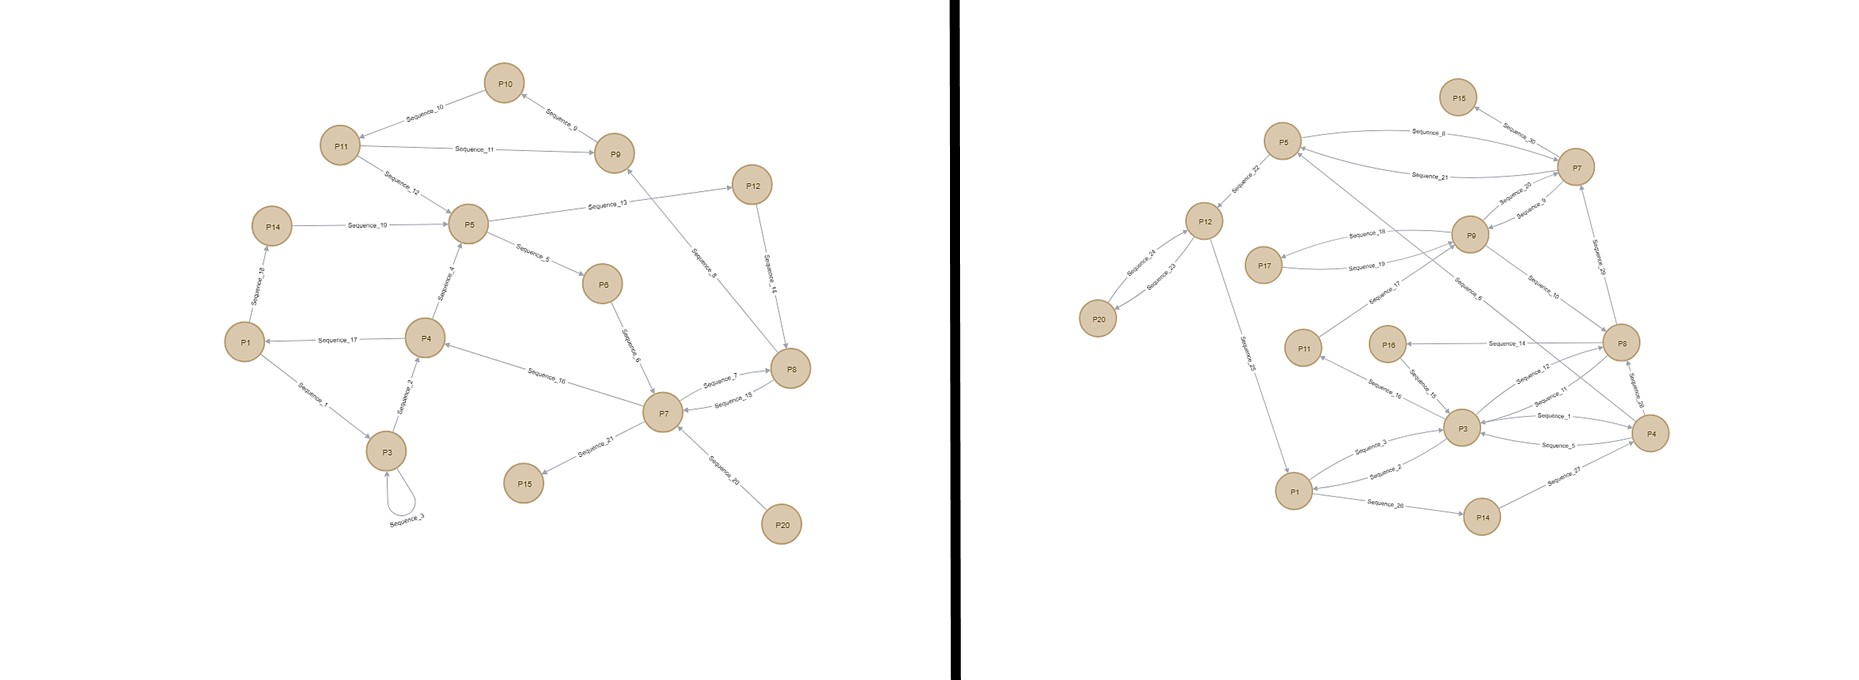 Identifying malicious IoT botnet activity using graph theory